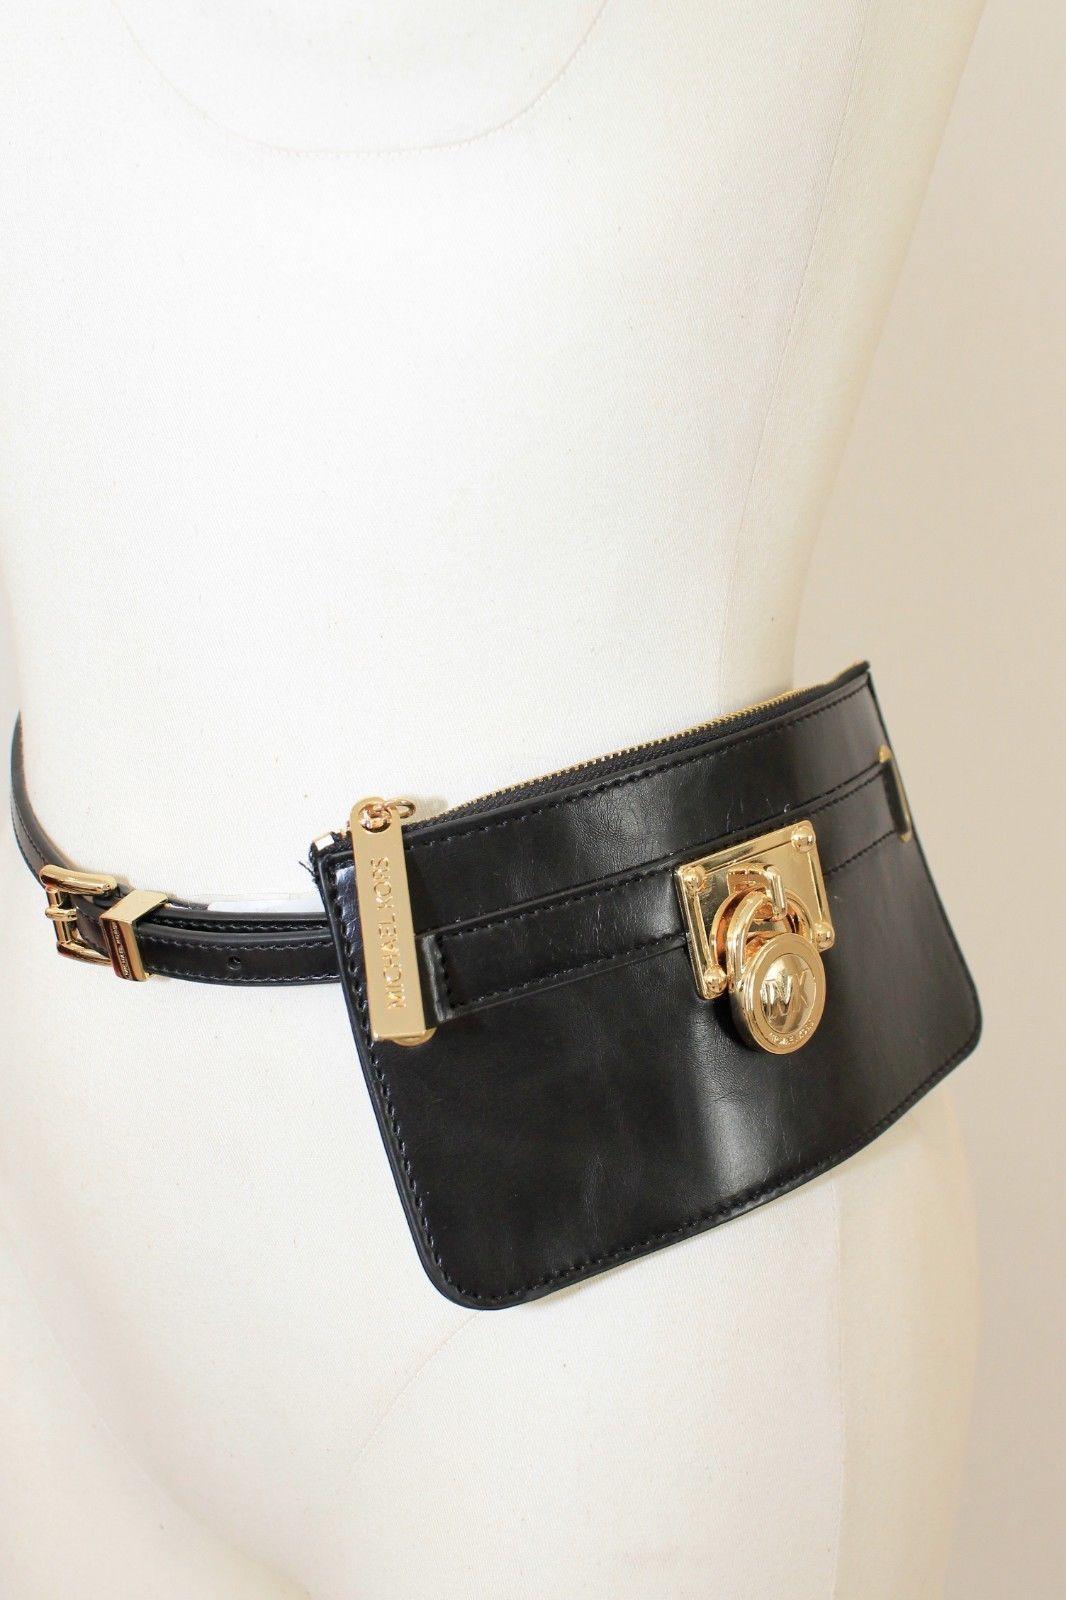 f7ce987ce5ae Michael Kors Ladies Leather Belt Bag Black Gold Designer Fanny Pack Sz M